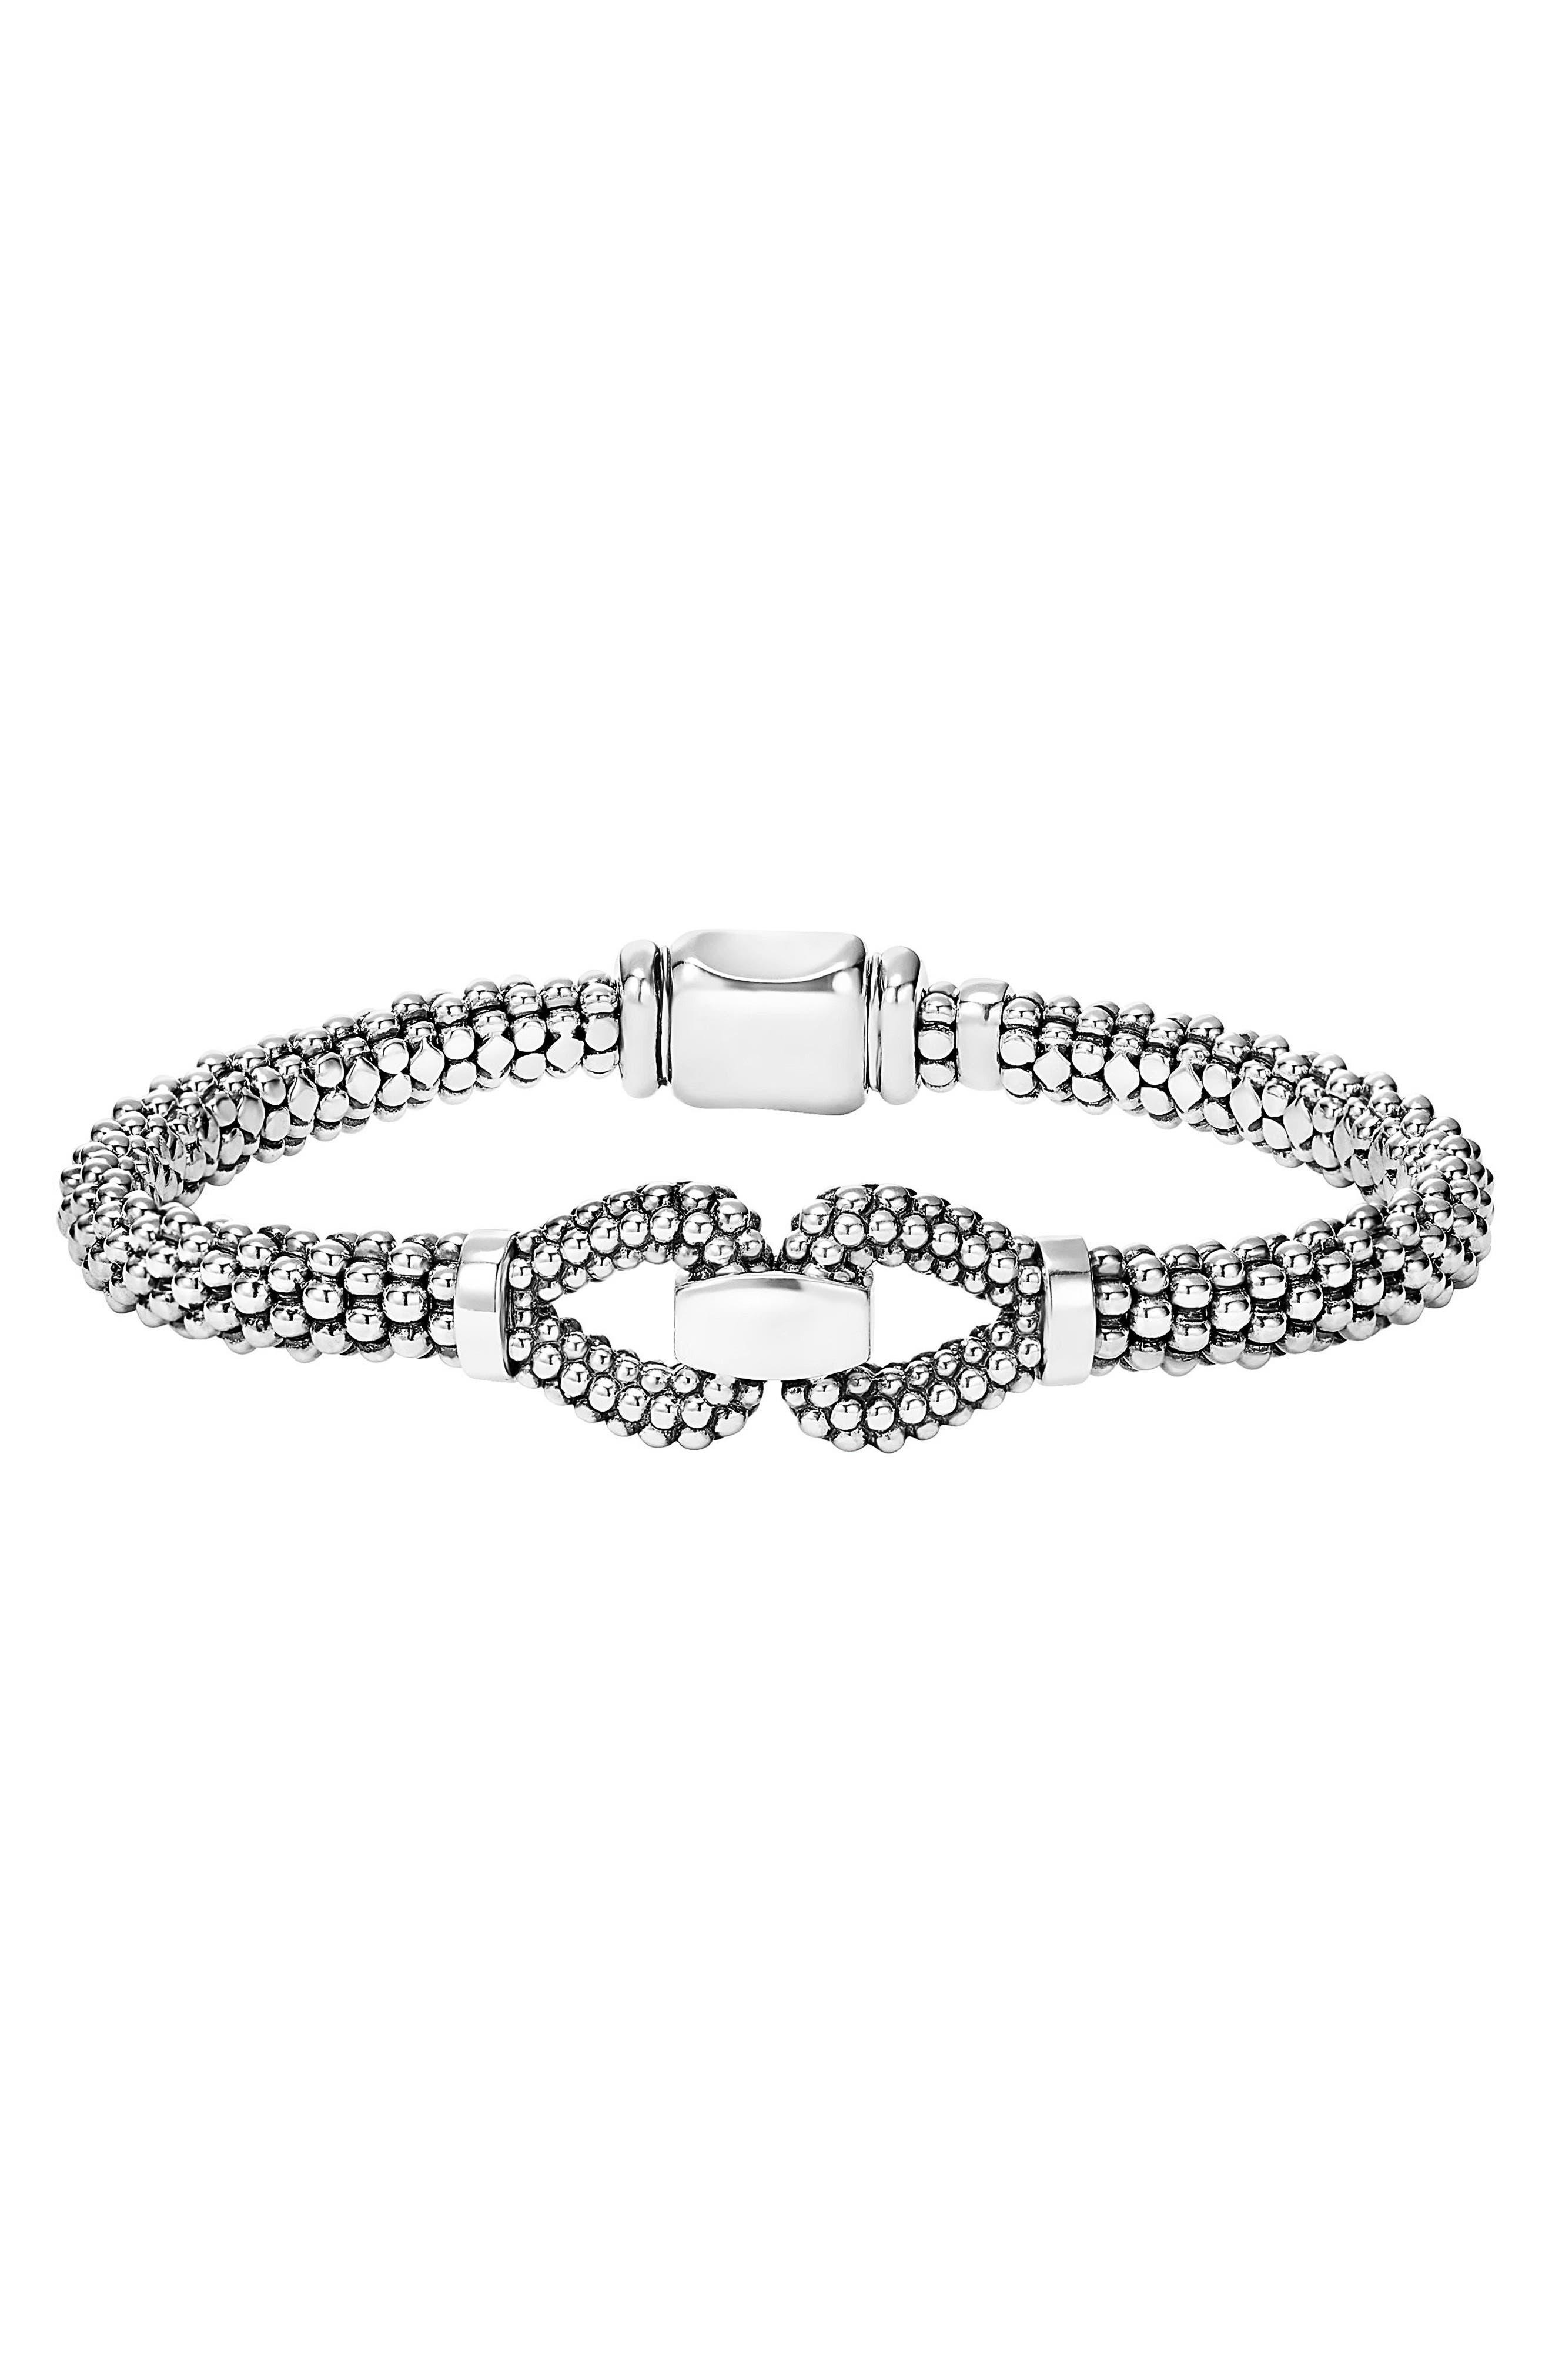 Derby Caviar Bracelet,                         Main,                         color, Silver